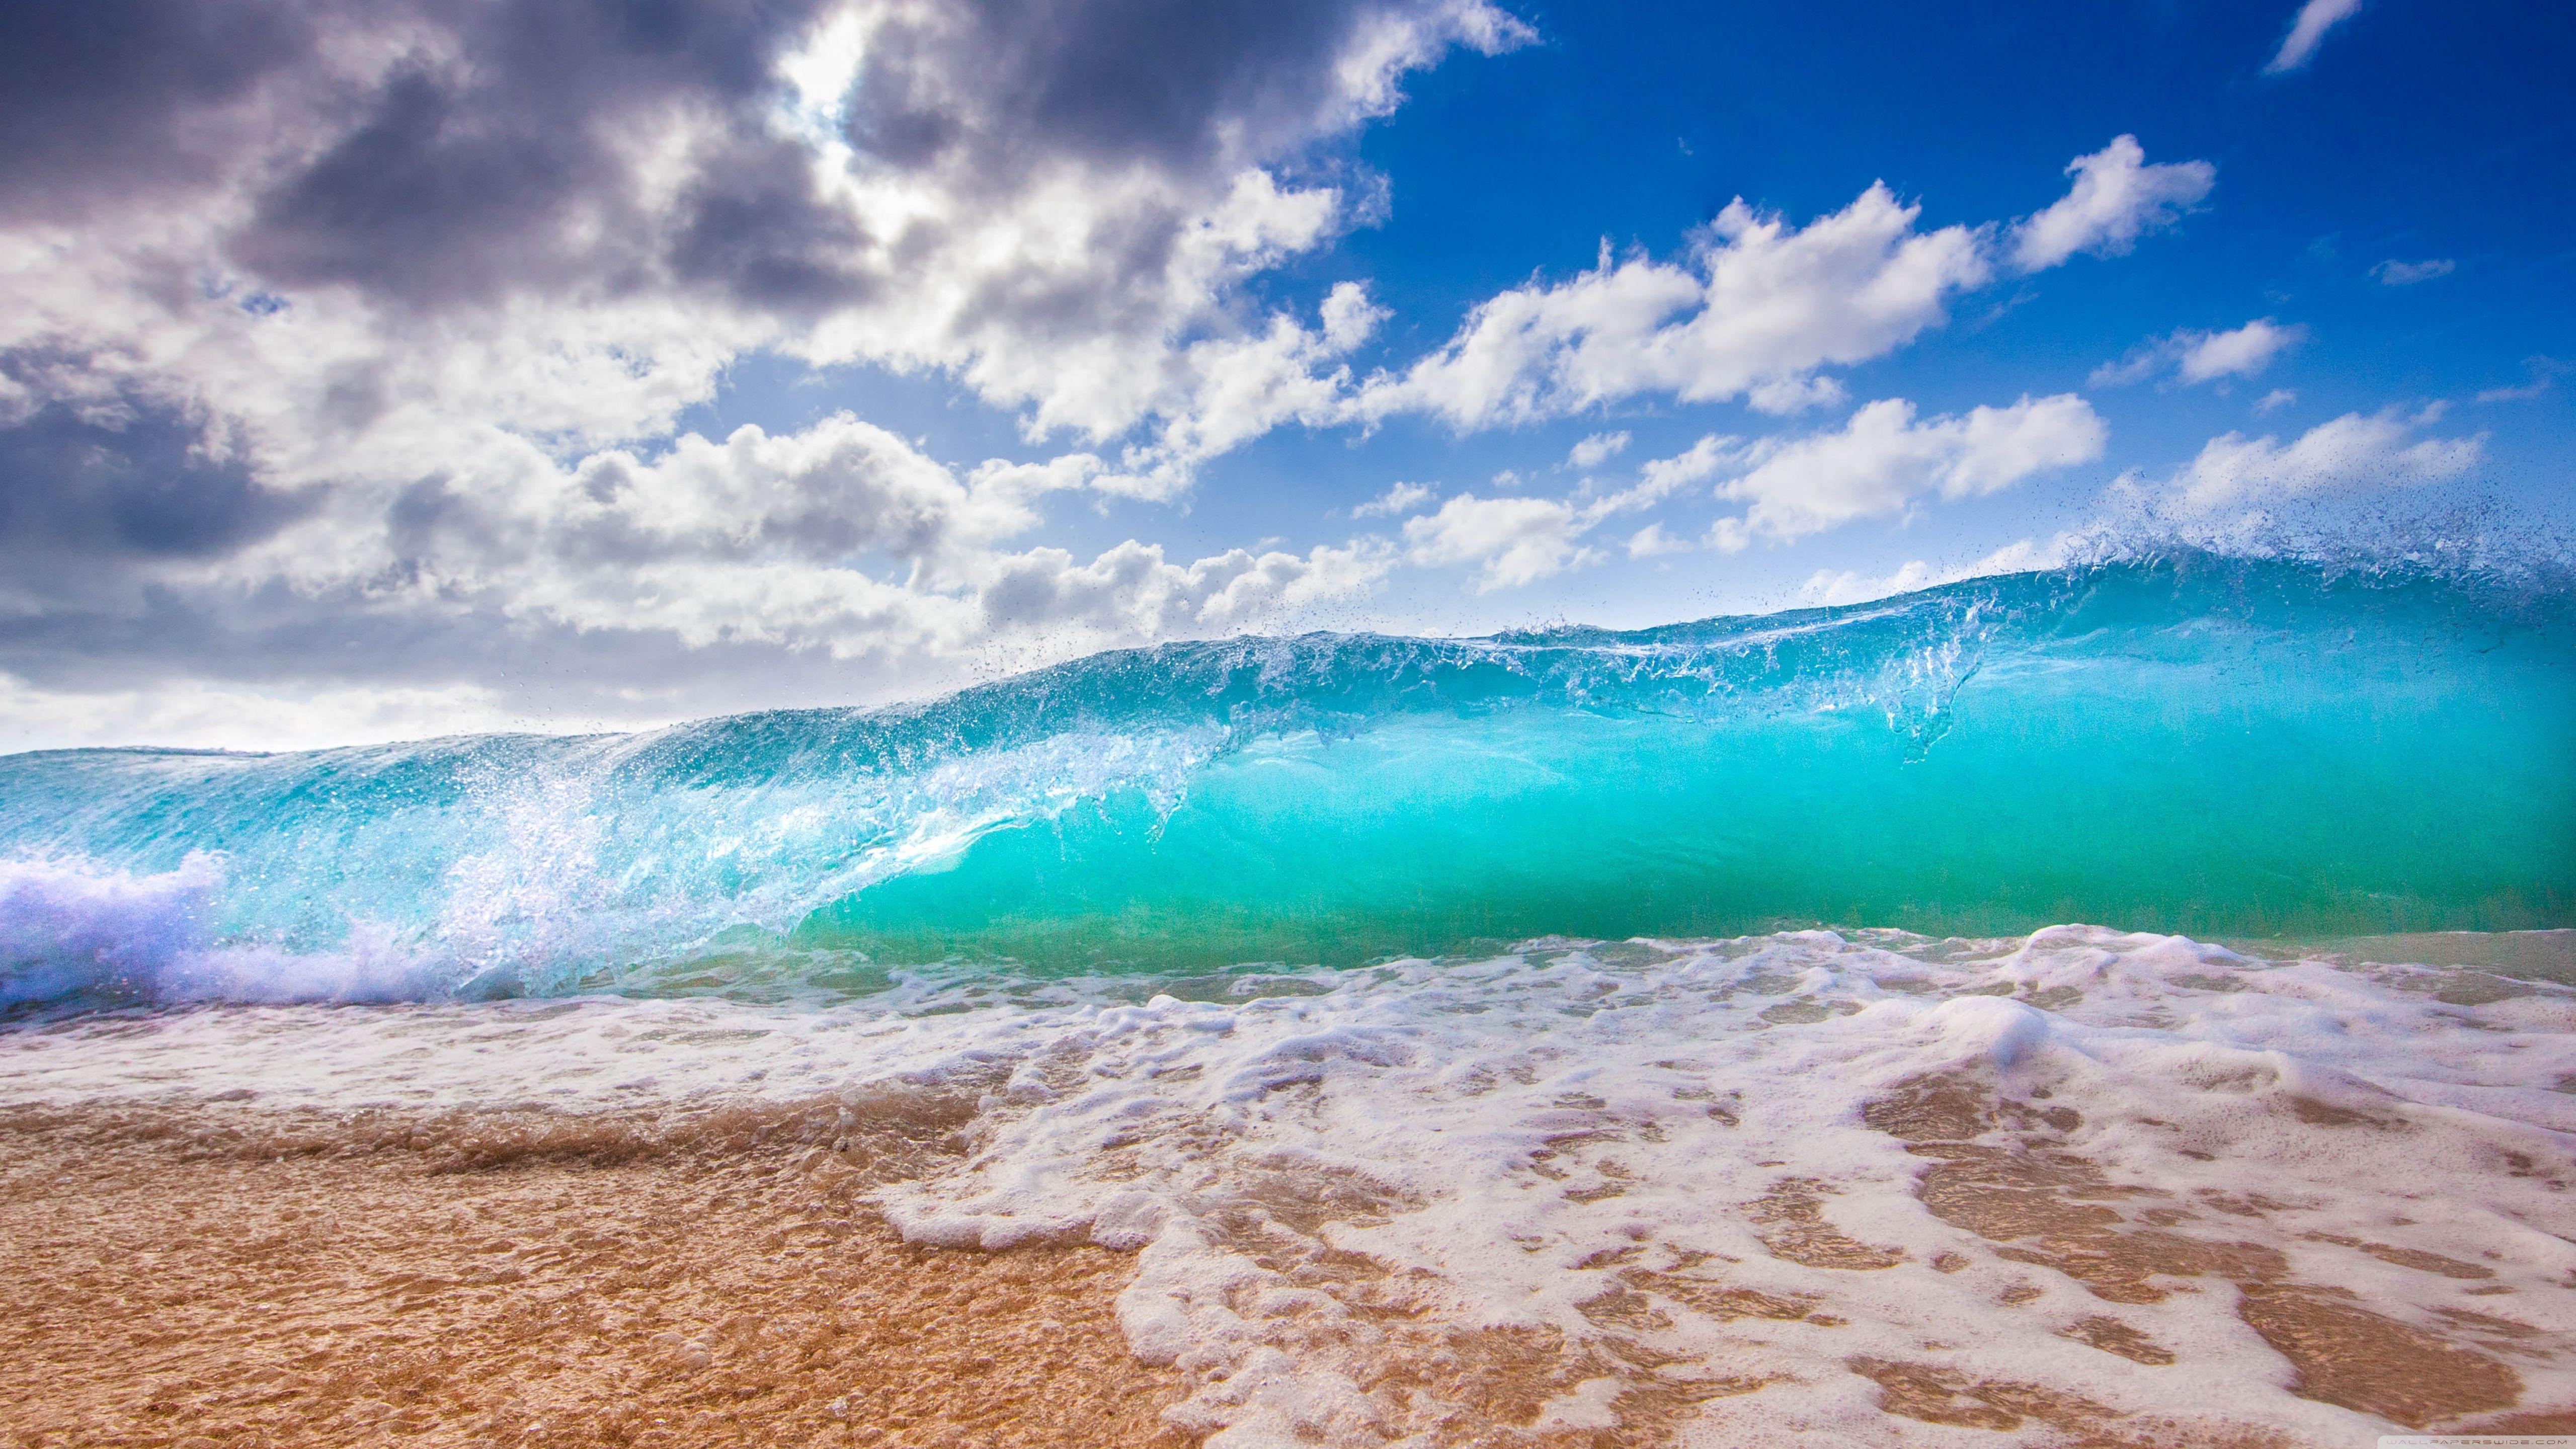 Ocean Waves ❤ 4k Hd Desktop Wallpaper For 4k Ultra - Iphone Wallpaper Hawaii Beach - HD Wallpaper